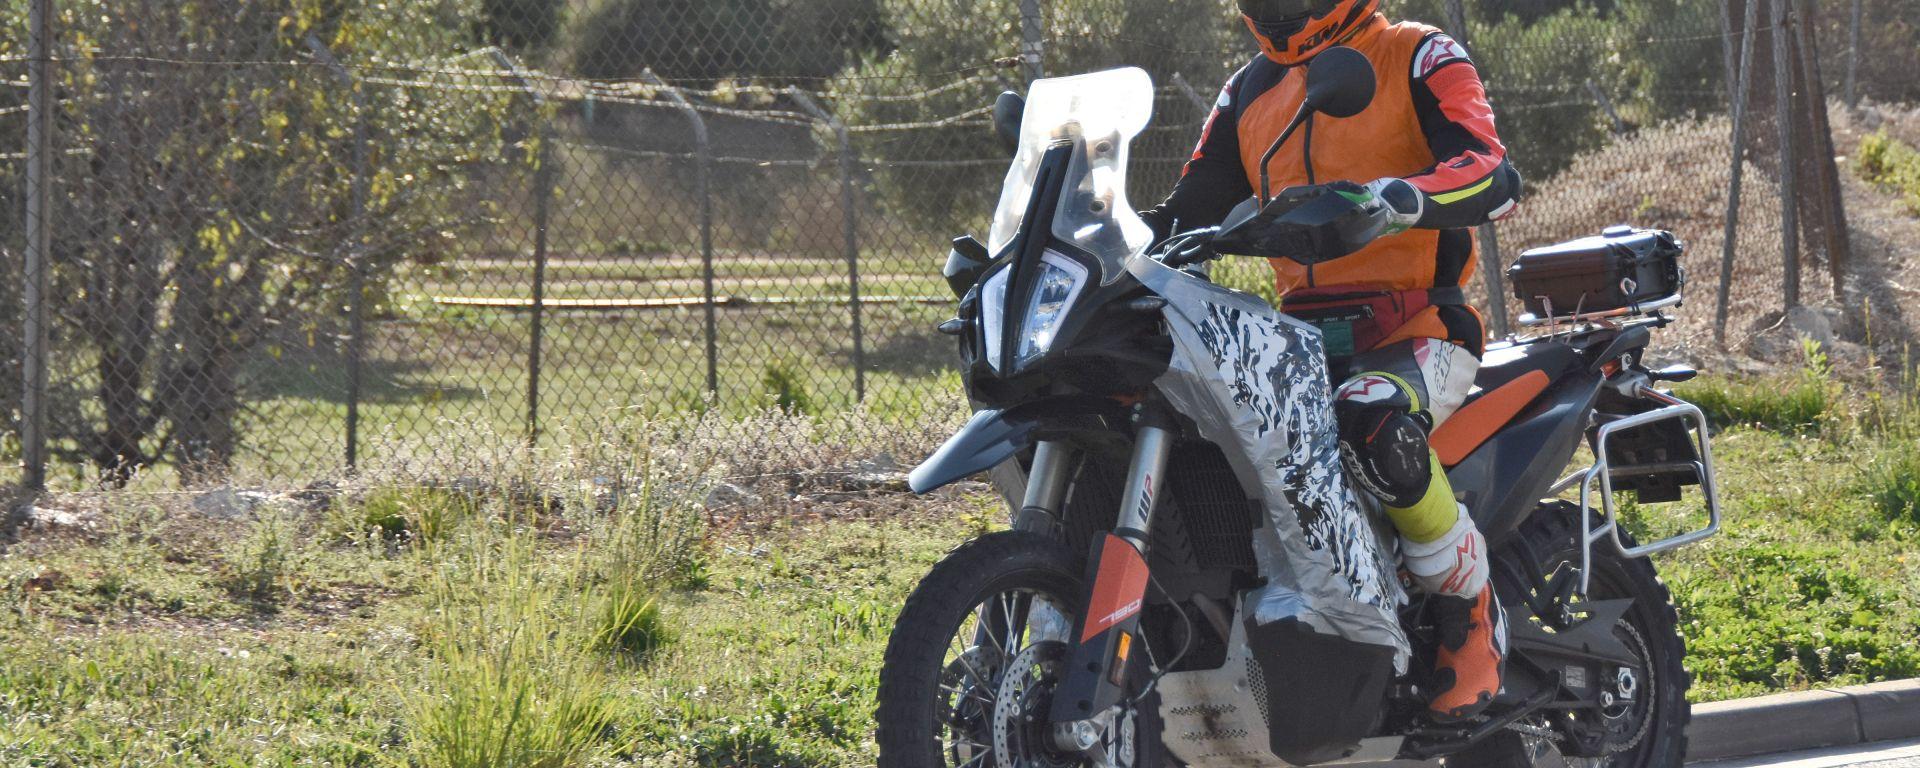 KTM: una 790 Adventure camuffata prova le nuove carene